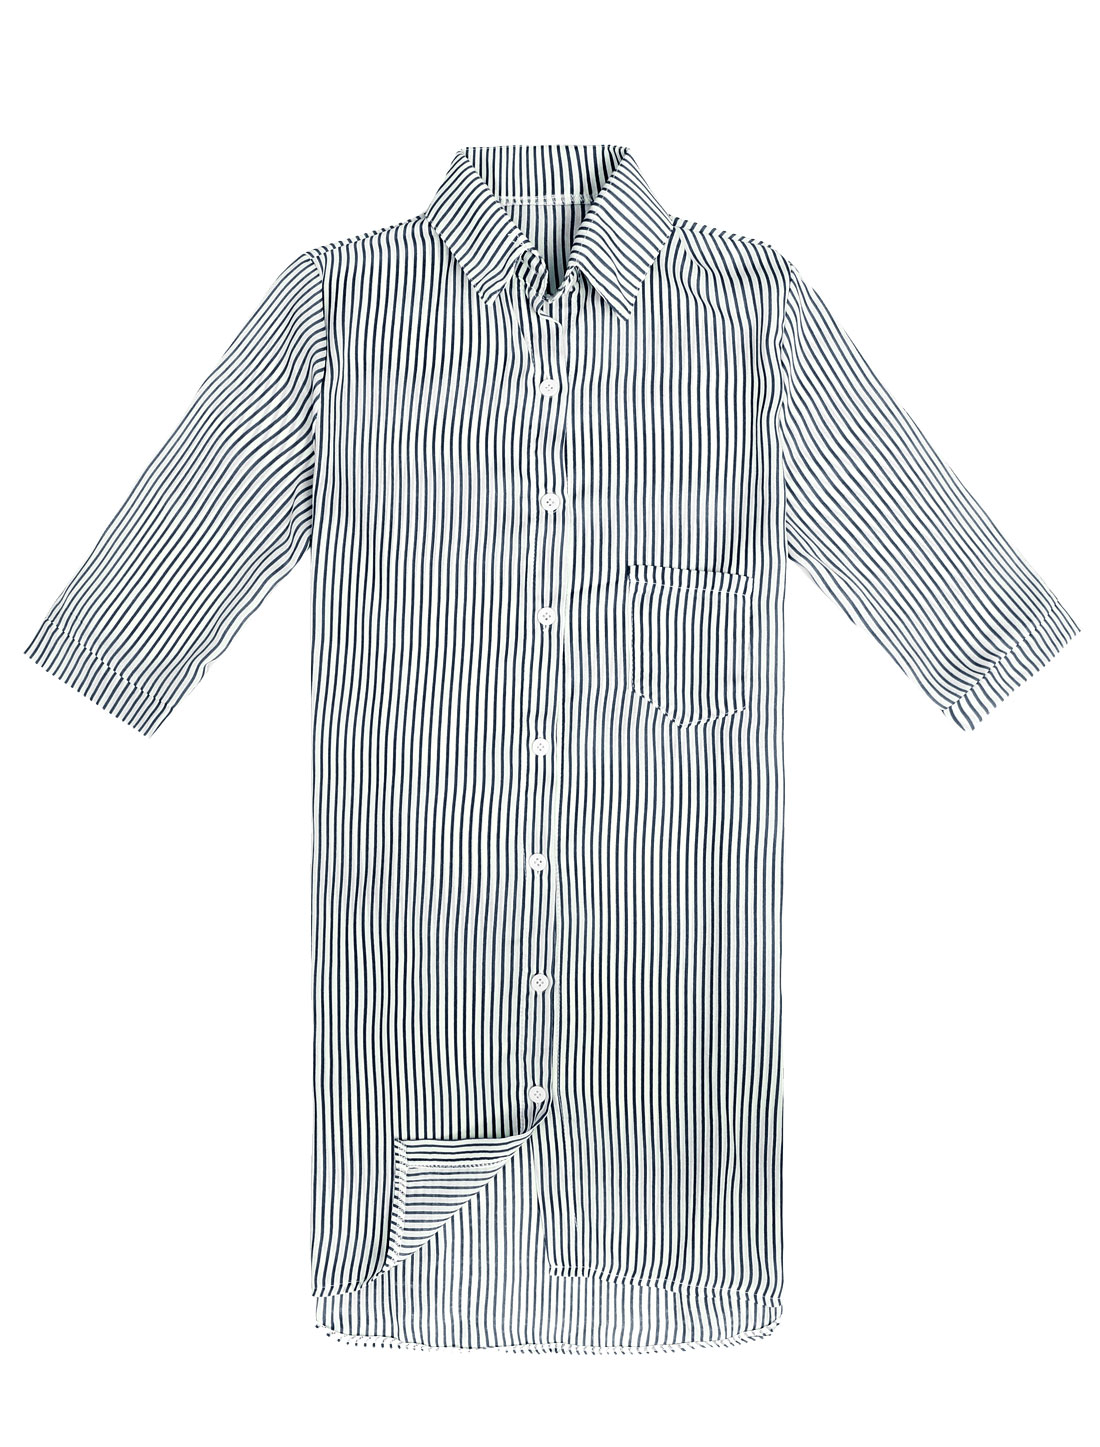 Lady 1/2 Sleeve Button Front Stripes Long Shirt Black White XS